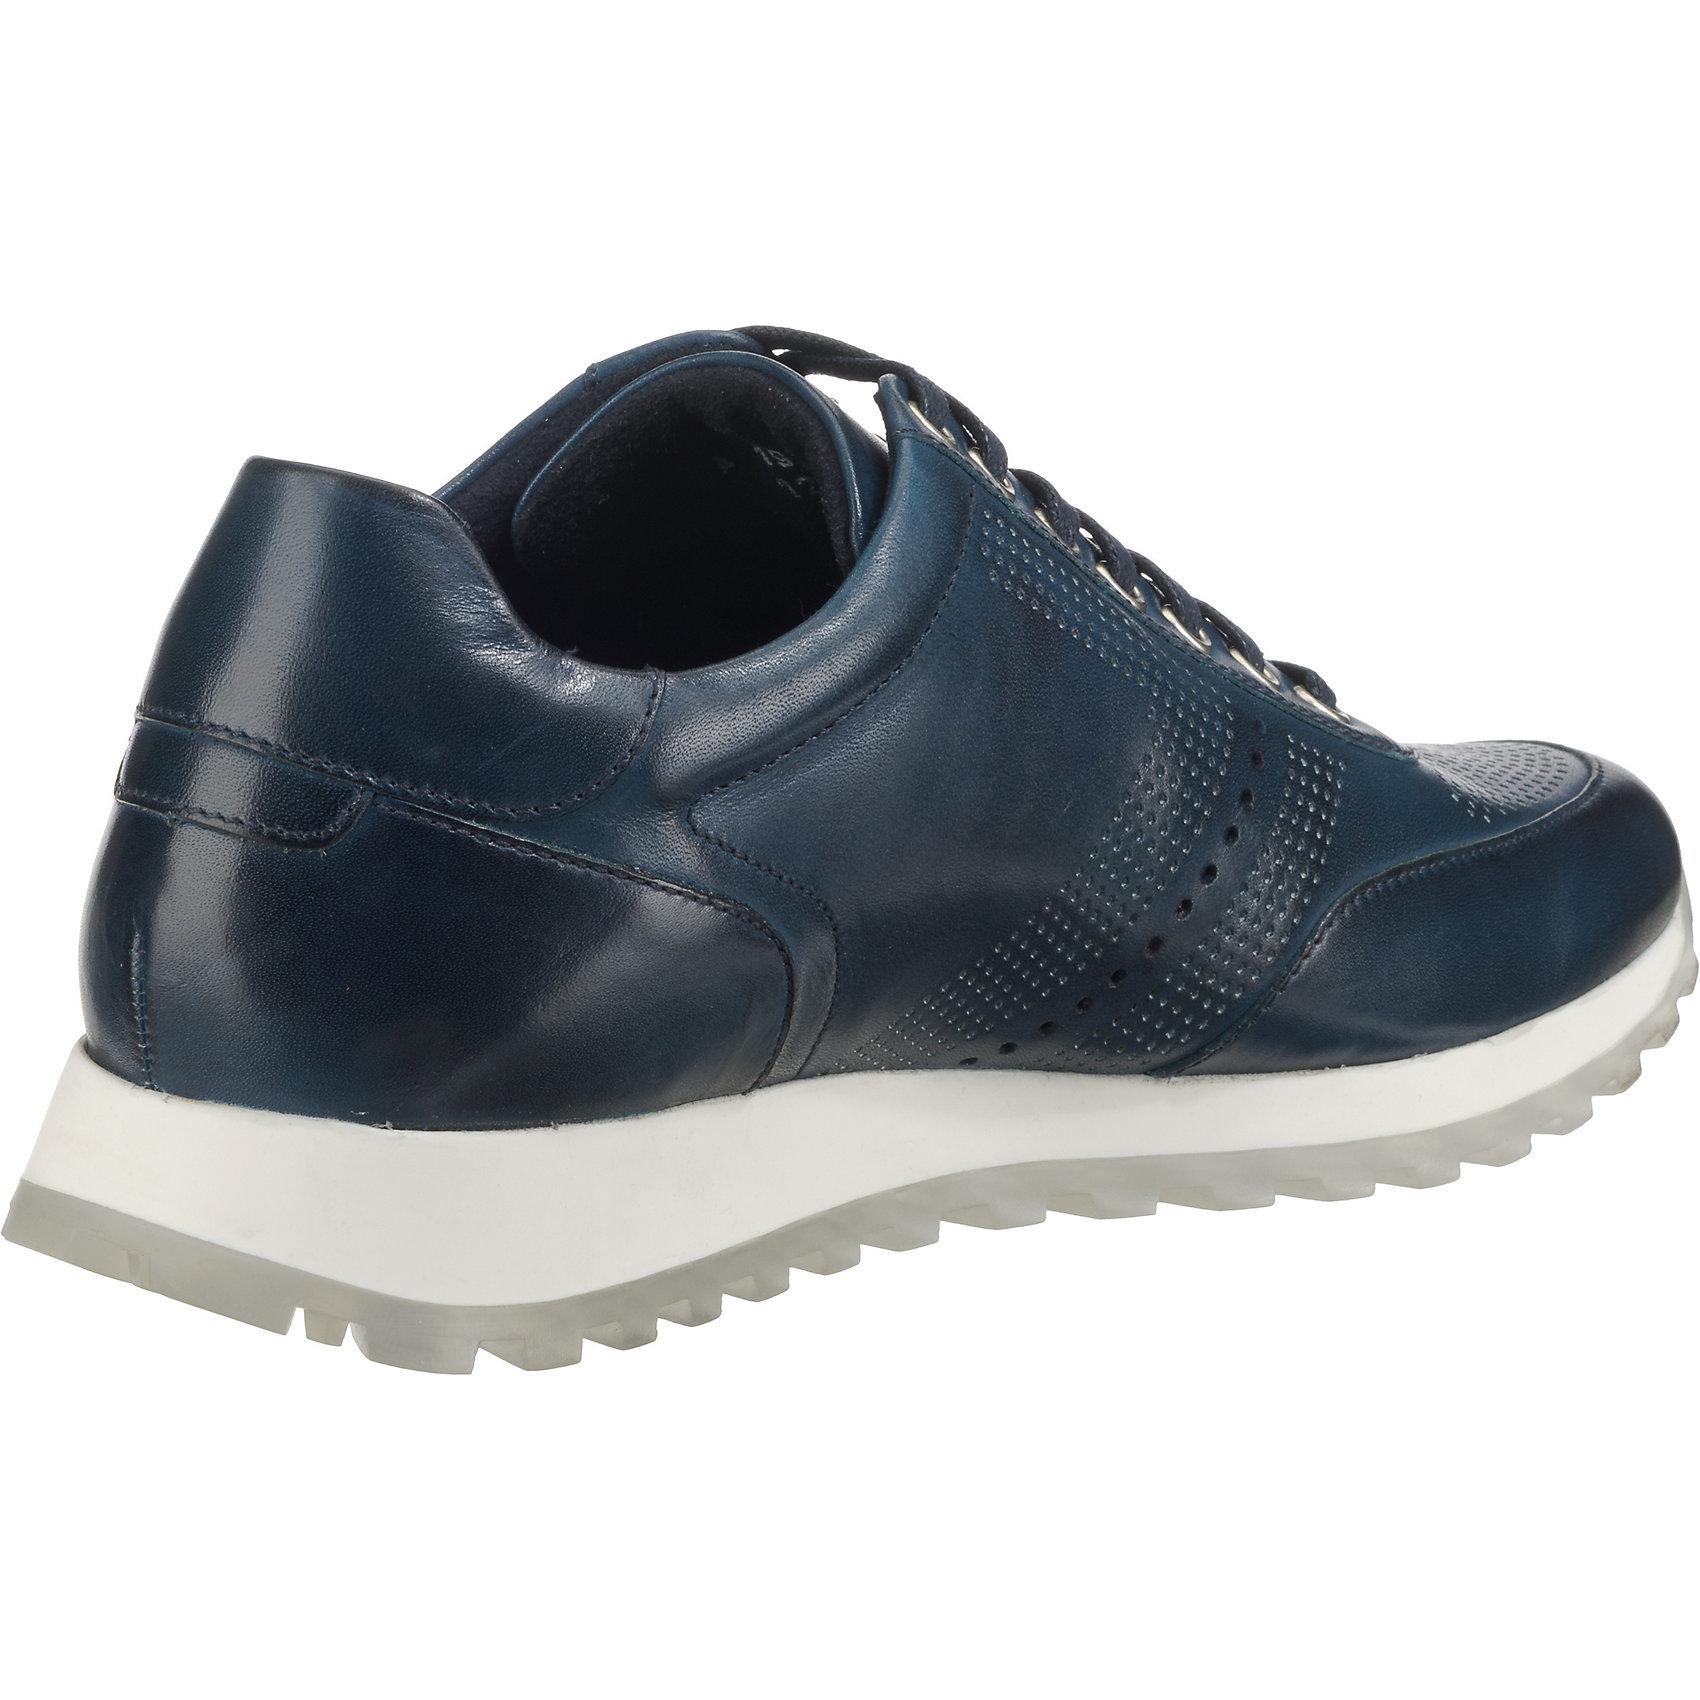 Neu Gordon & Bros Conte Sneakers Low 6815641 für Herren